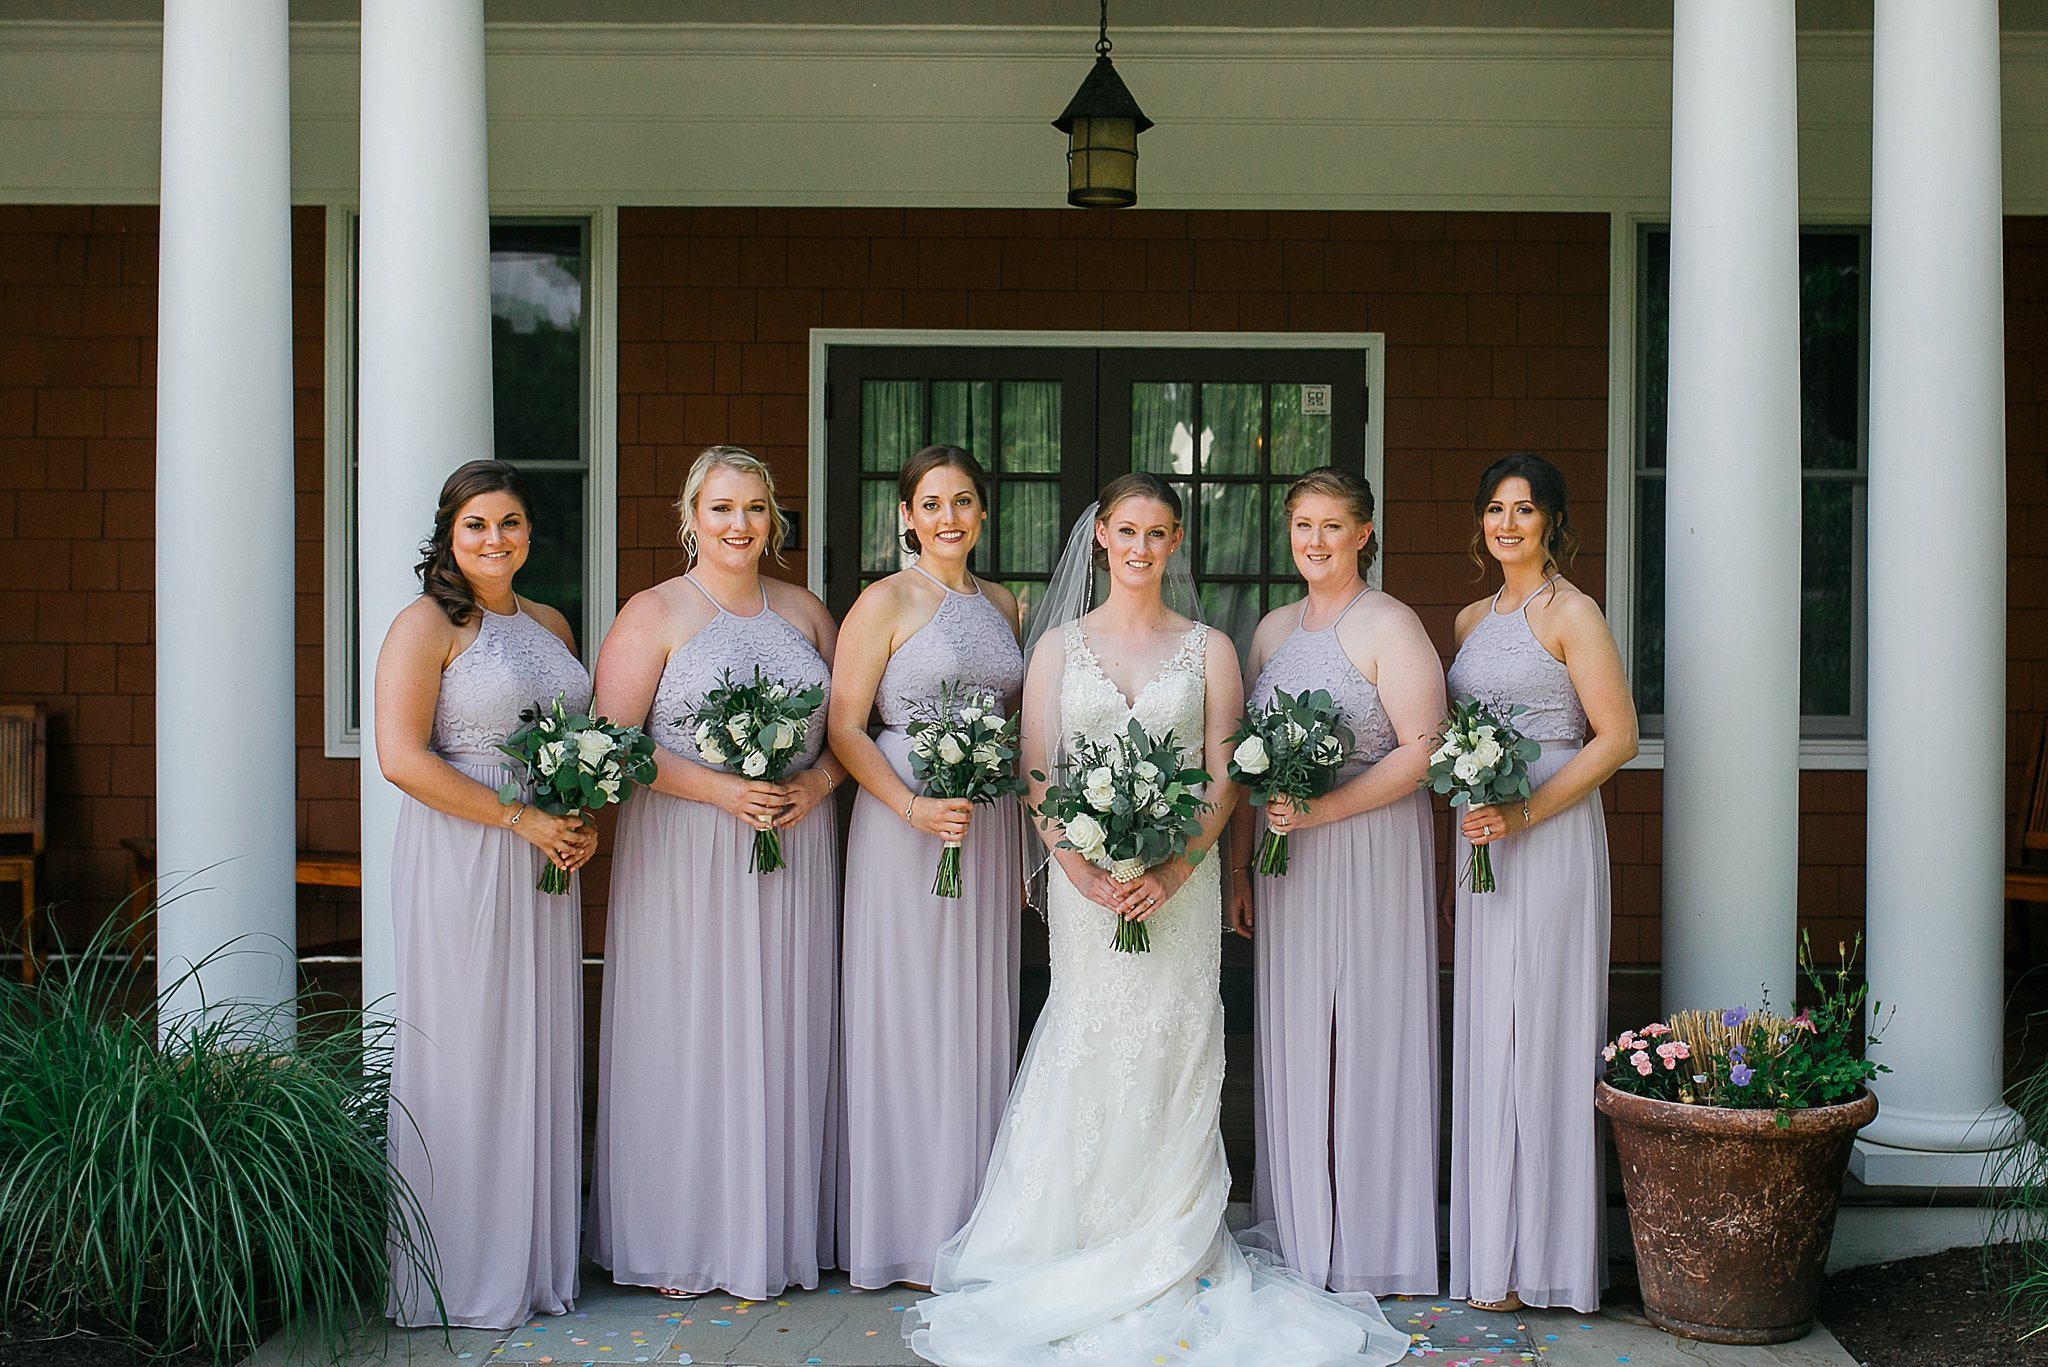 Hollow Brook Golf Club Cortlandt Manor NY Wedding Sweet Alice Photography June Wedding38.jpg